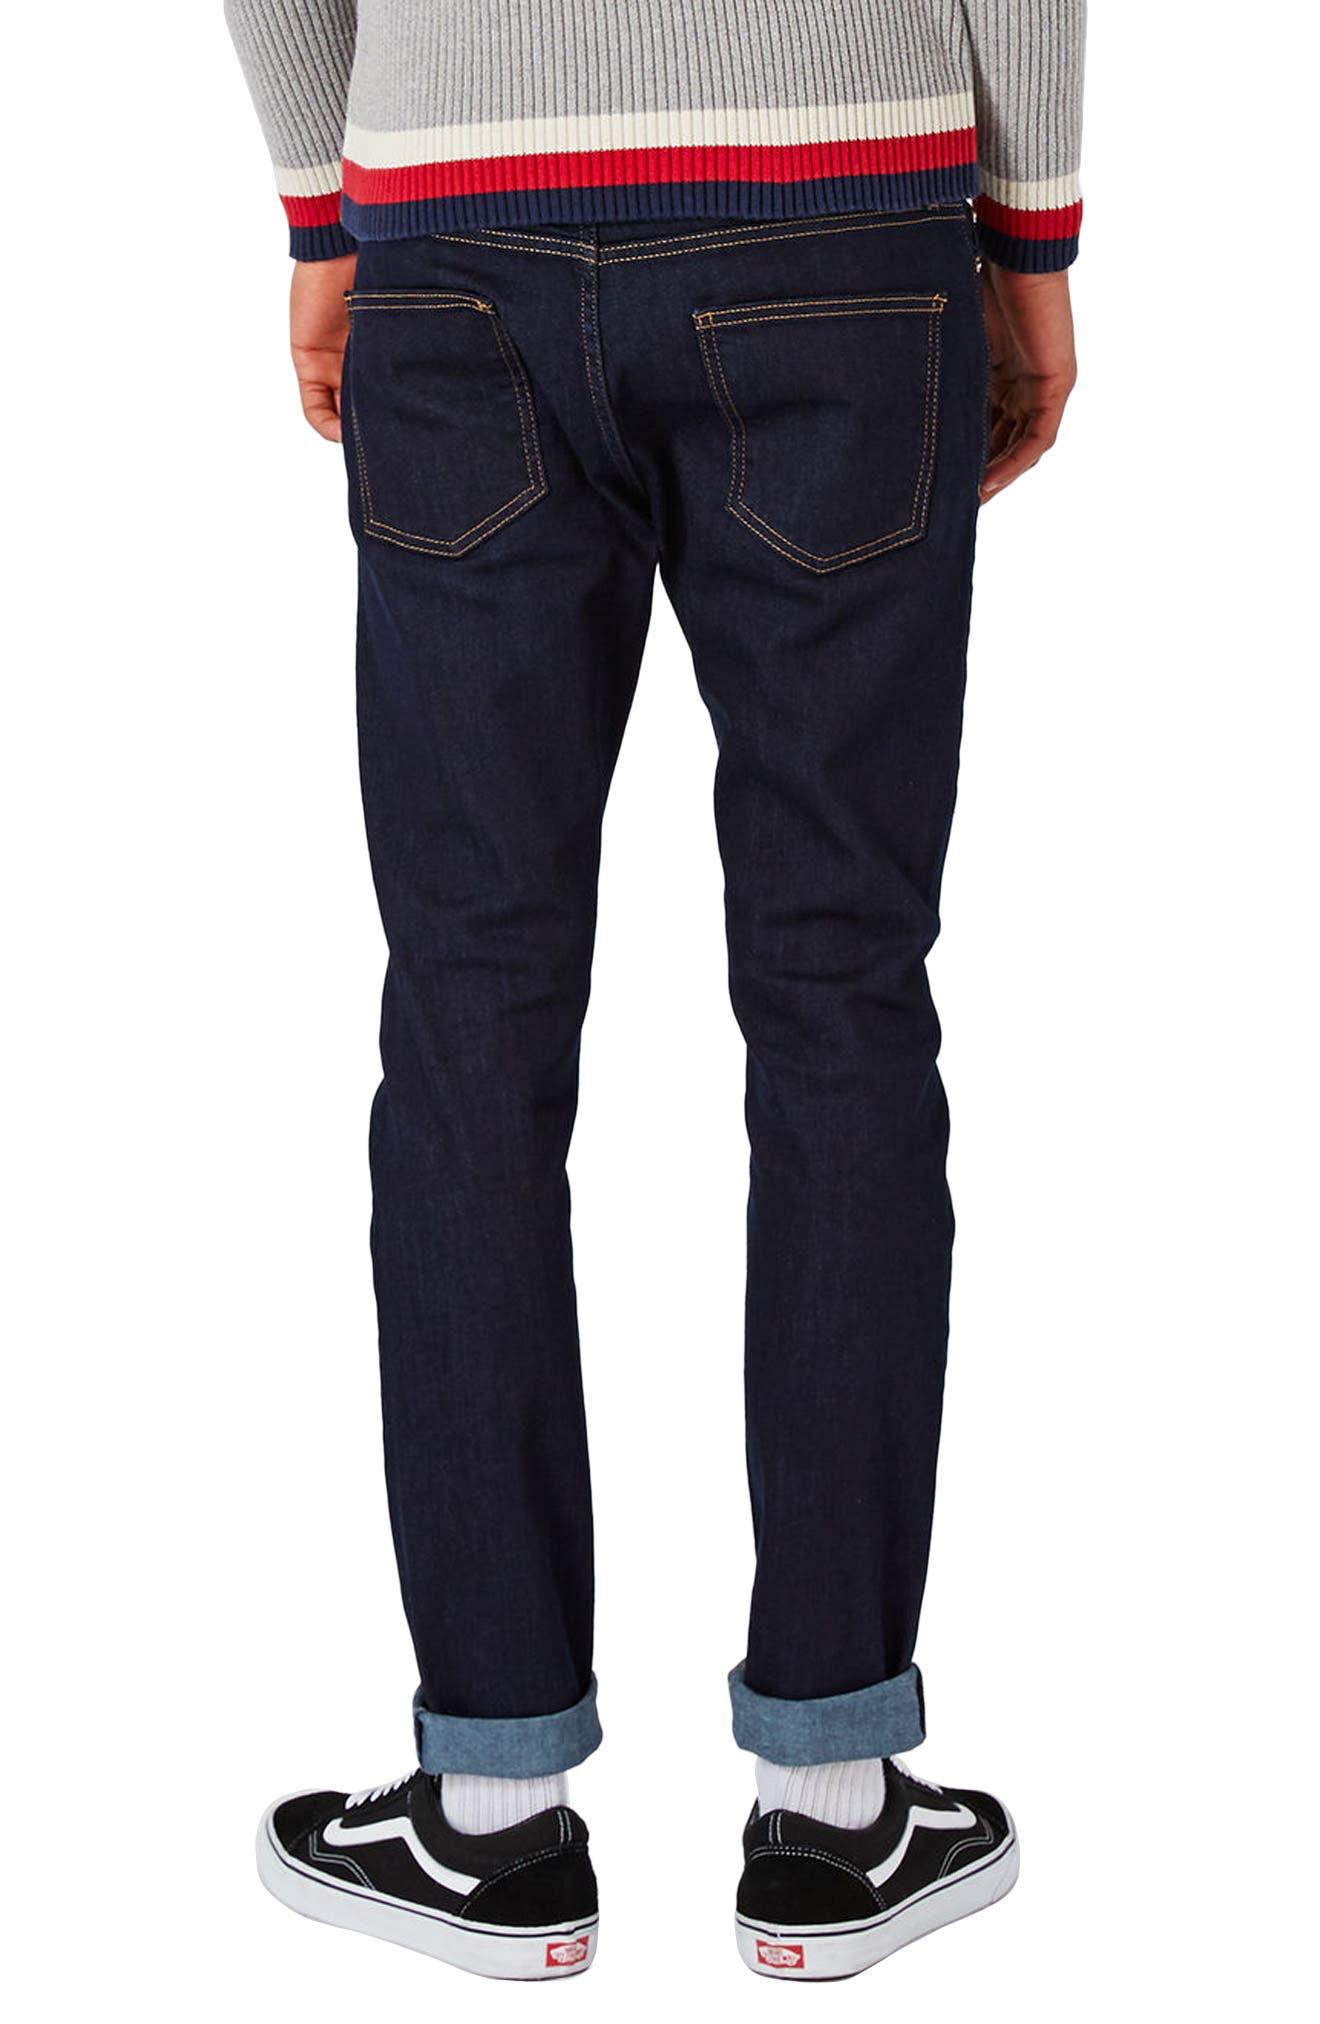 TOPMAN, Stretch Skinny Fit Raw Denim Jeans, Alternate thumbnail 2, color, BLUE